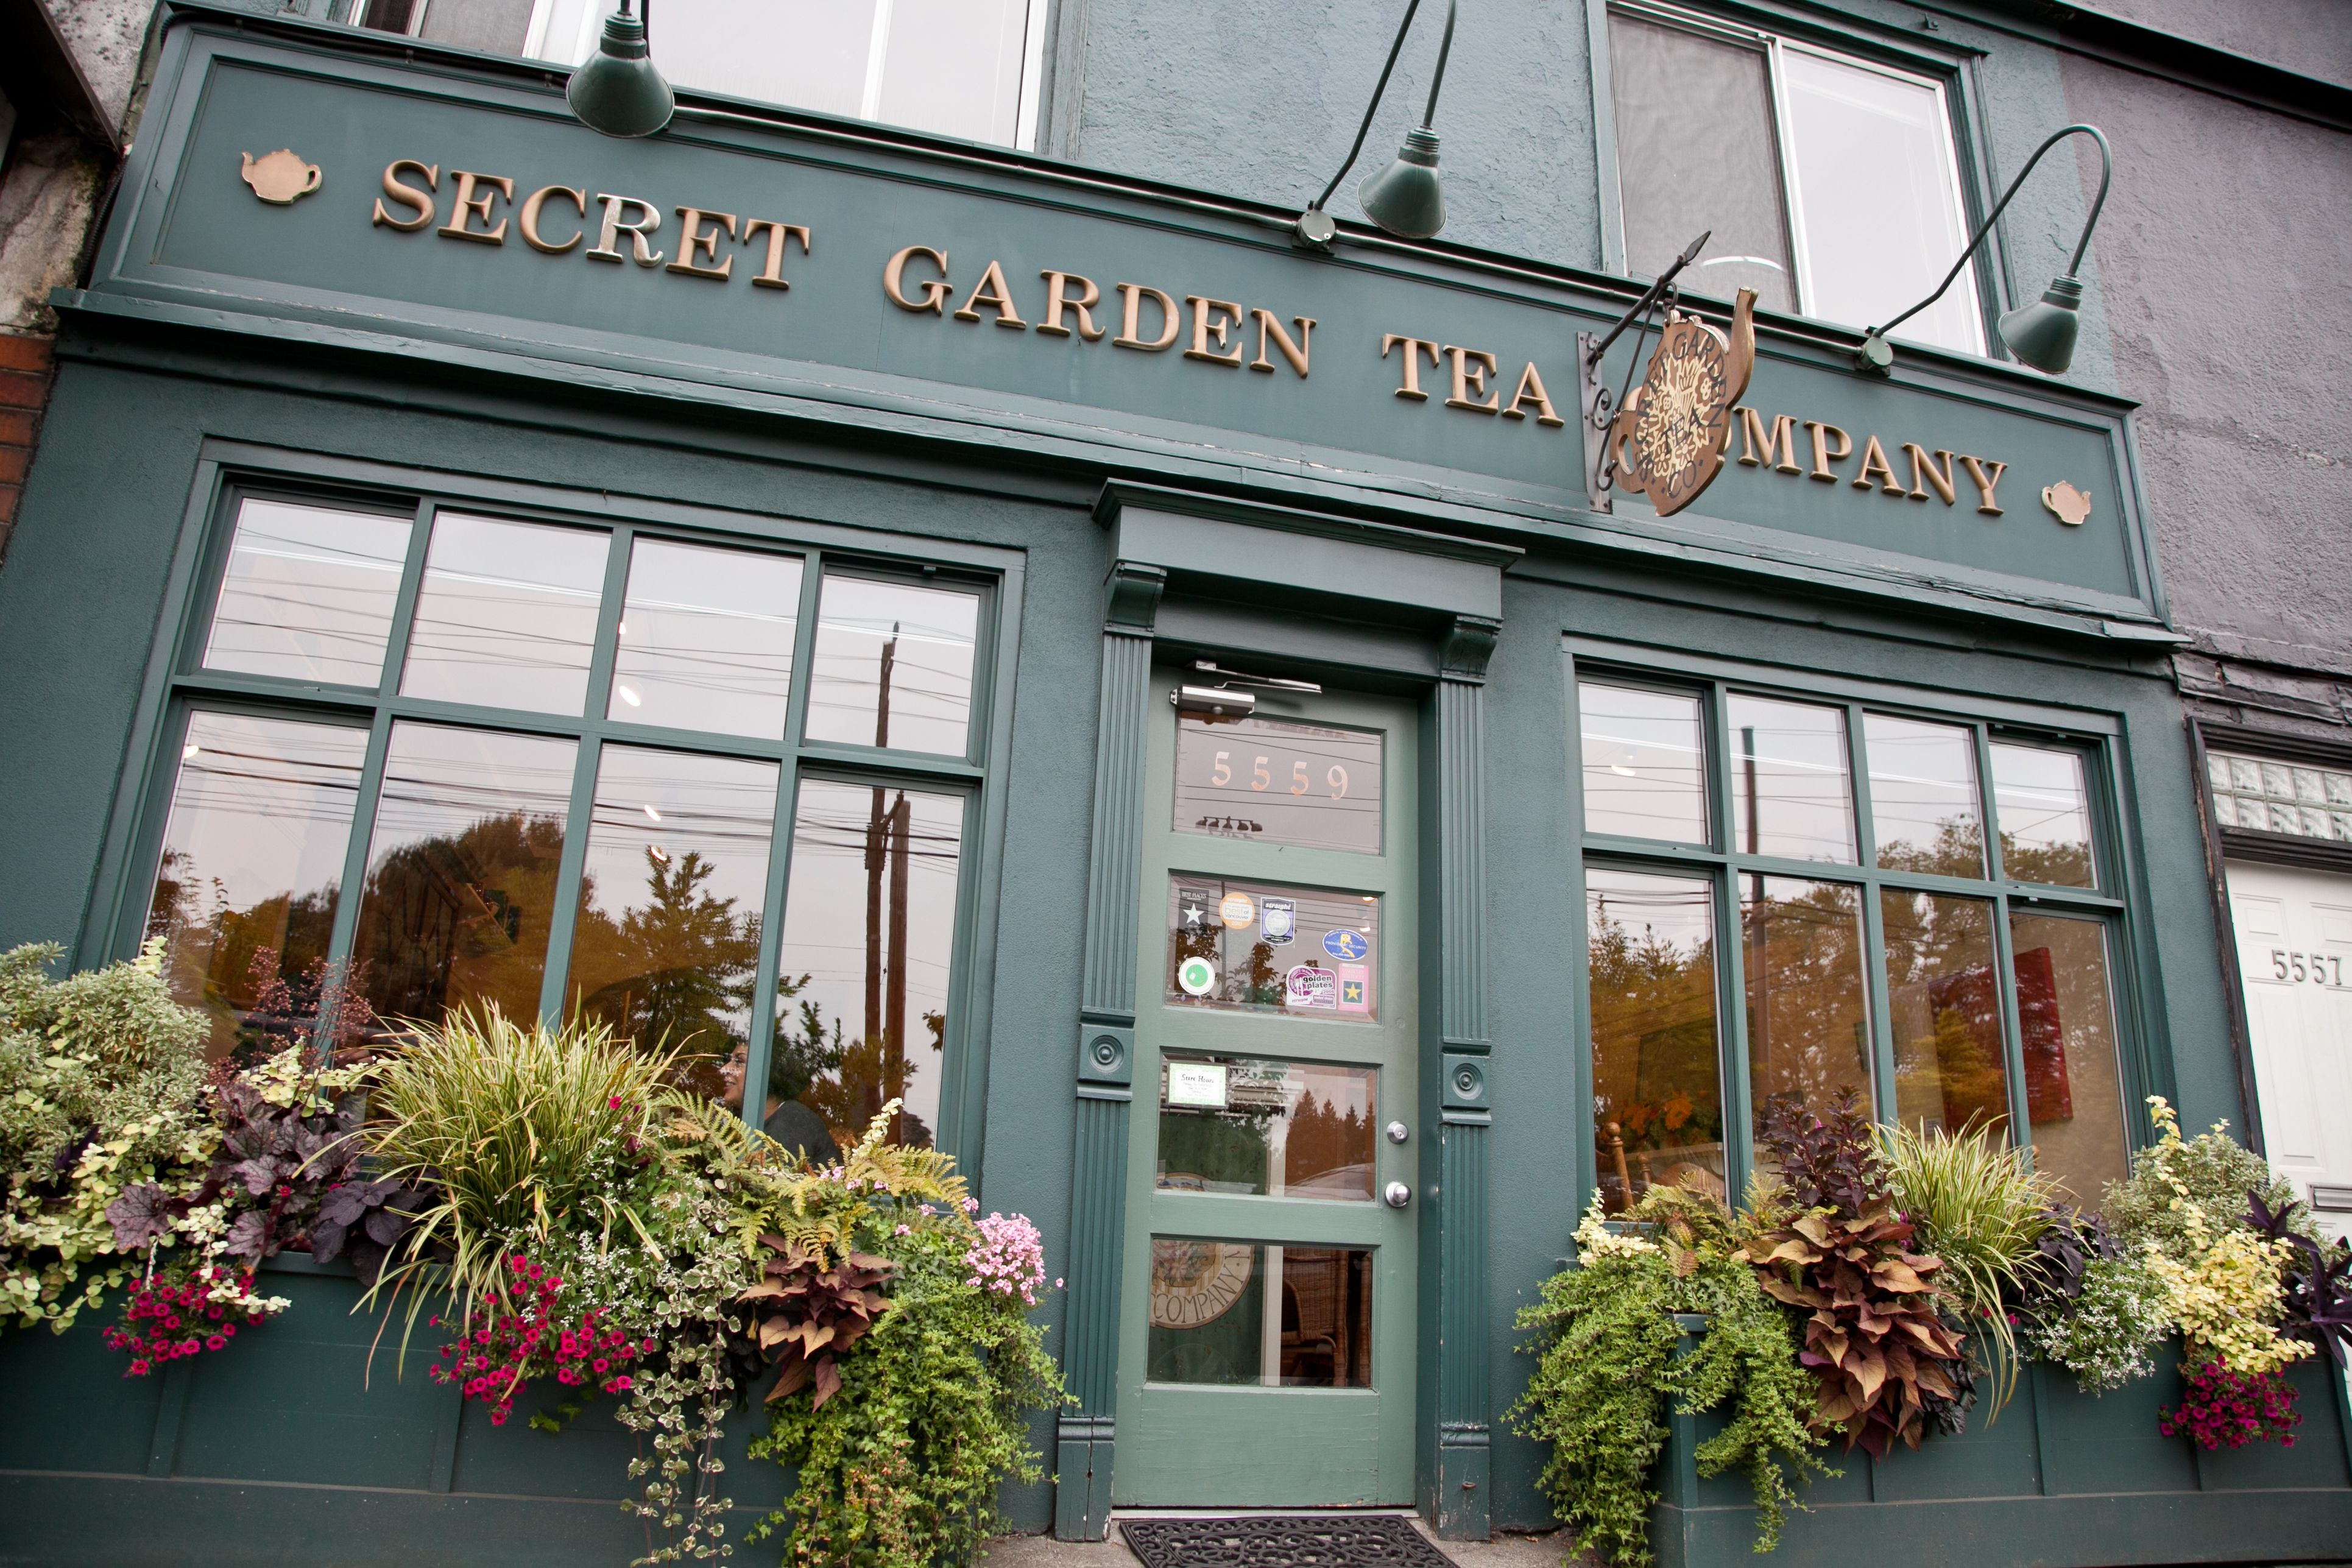 Visit | Secret Garden Tea Company